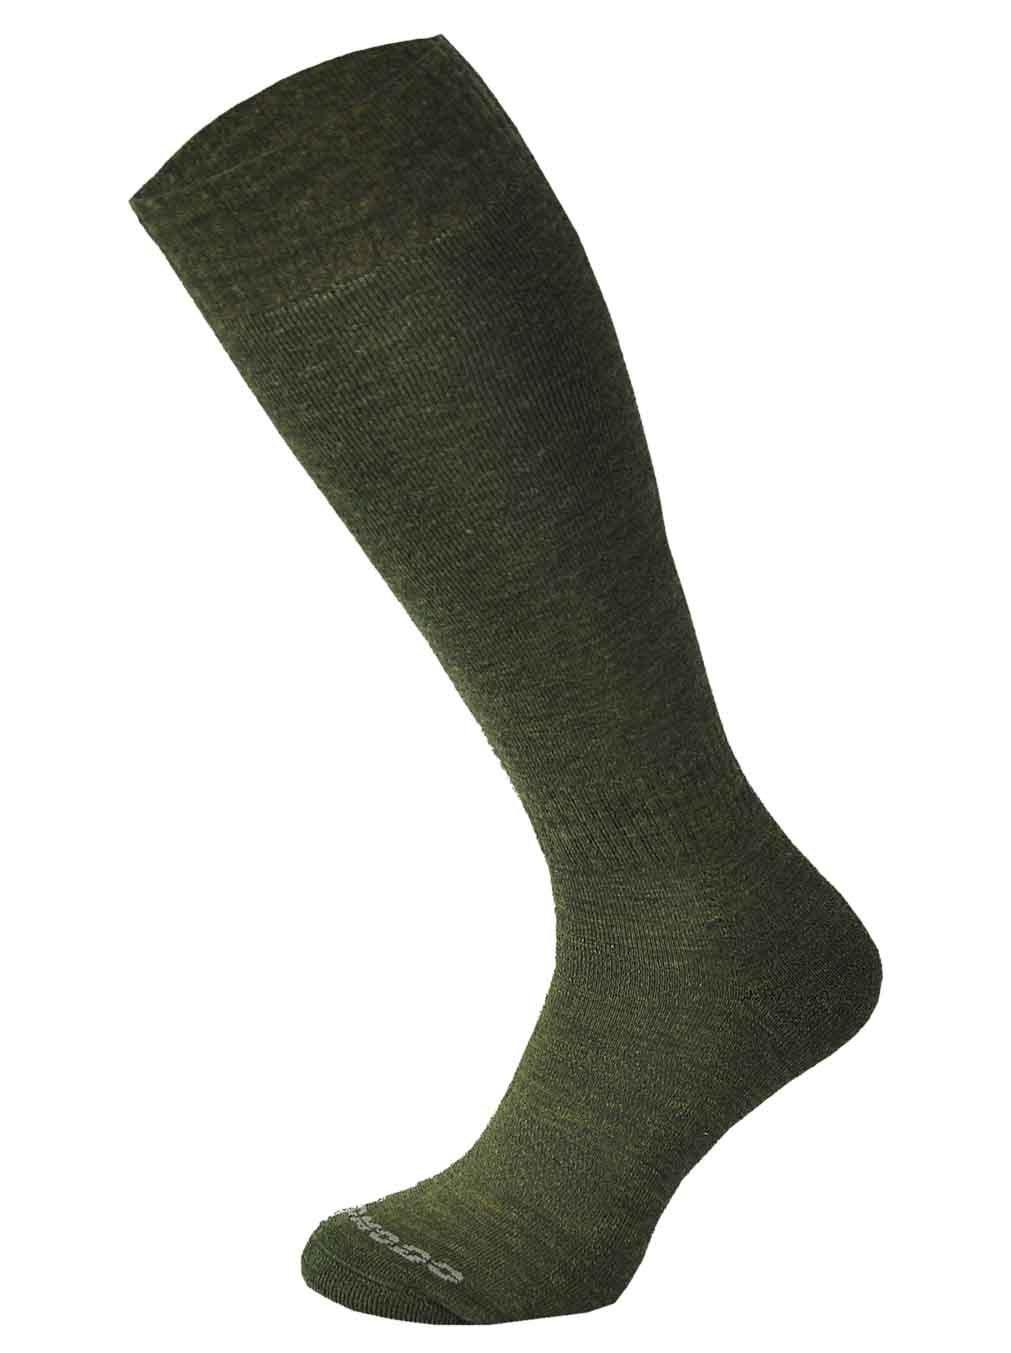 Merino Wool Long Shooting Hunting Socks